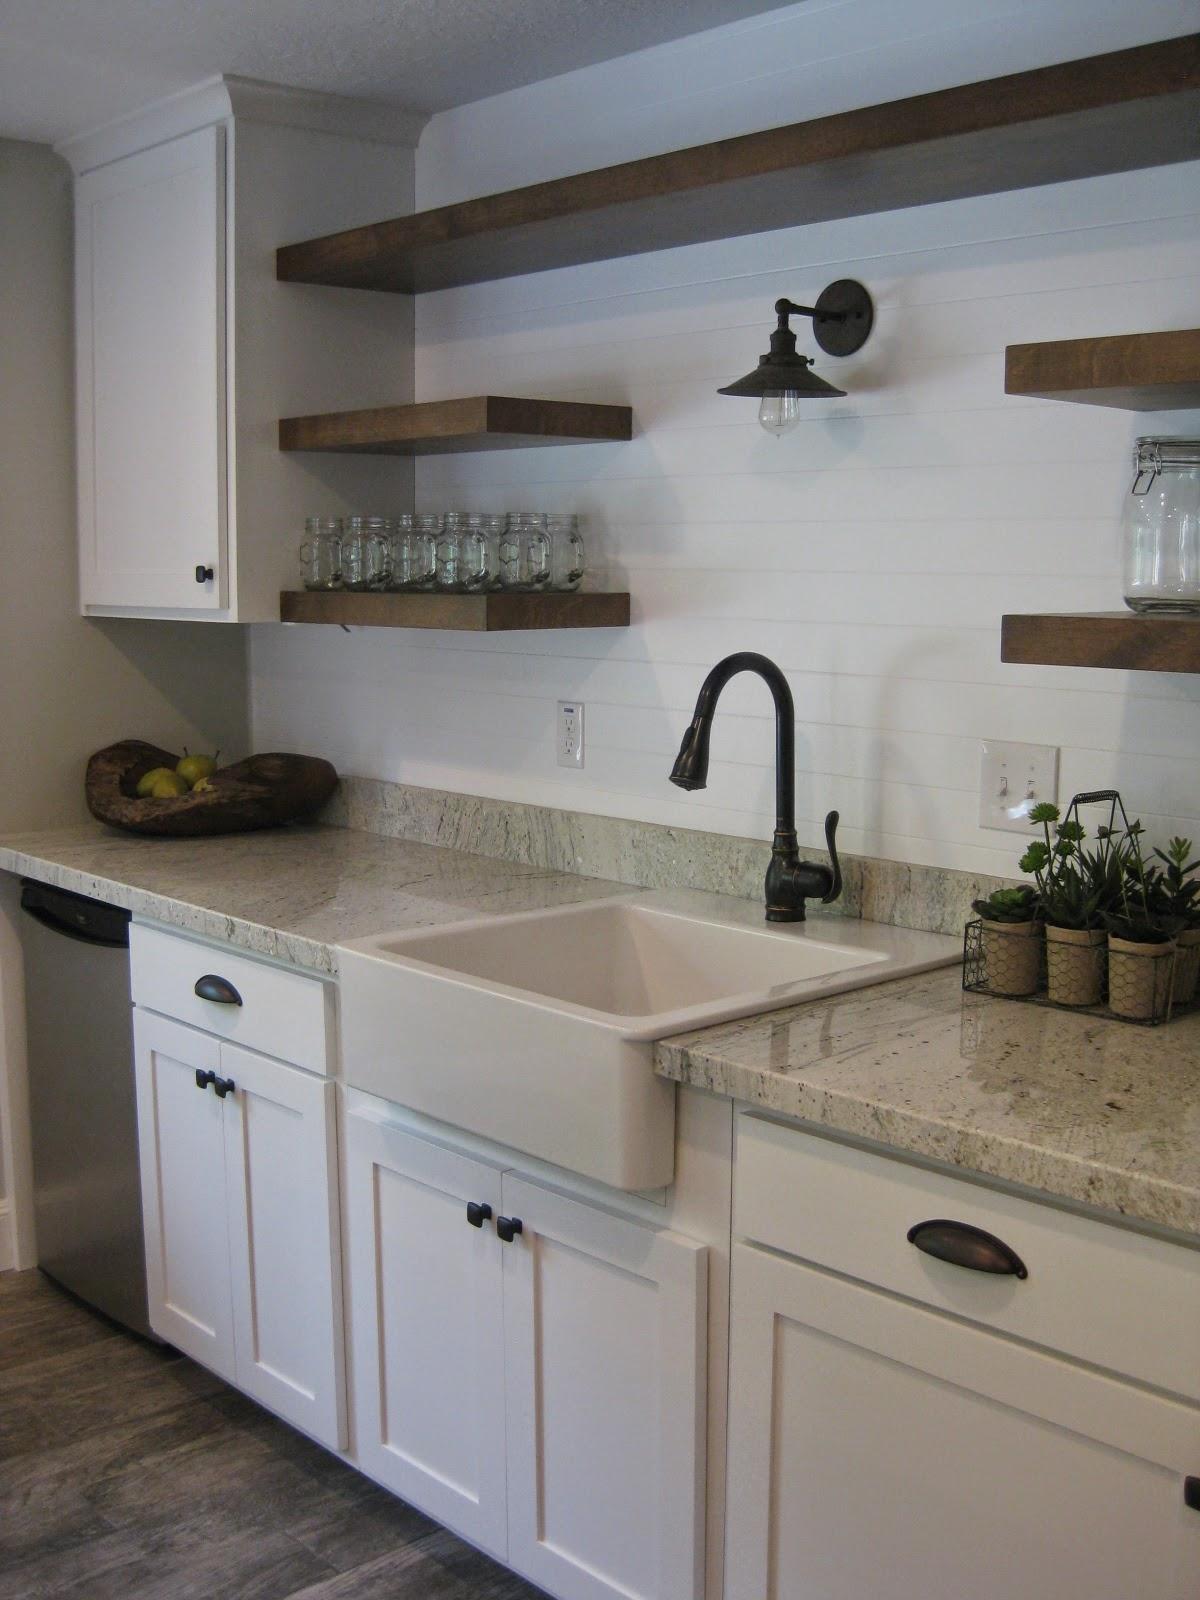 Tda Decorating And Design Basement Kitchen Before Amp After